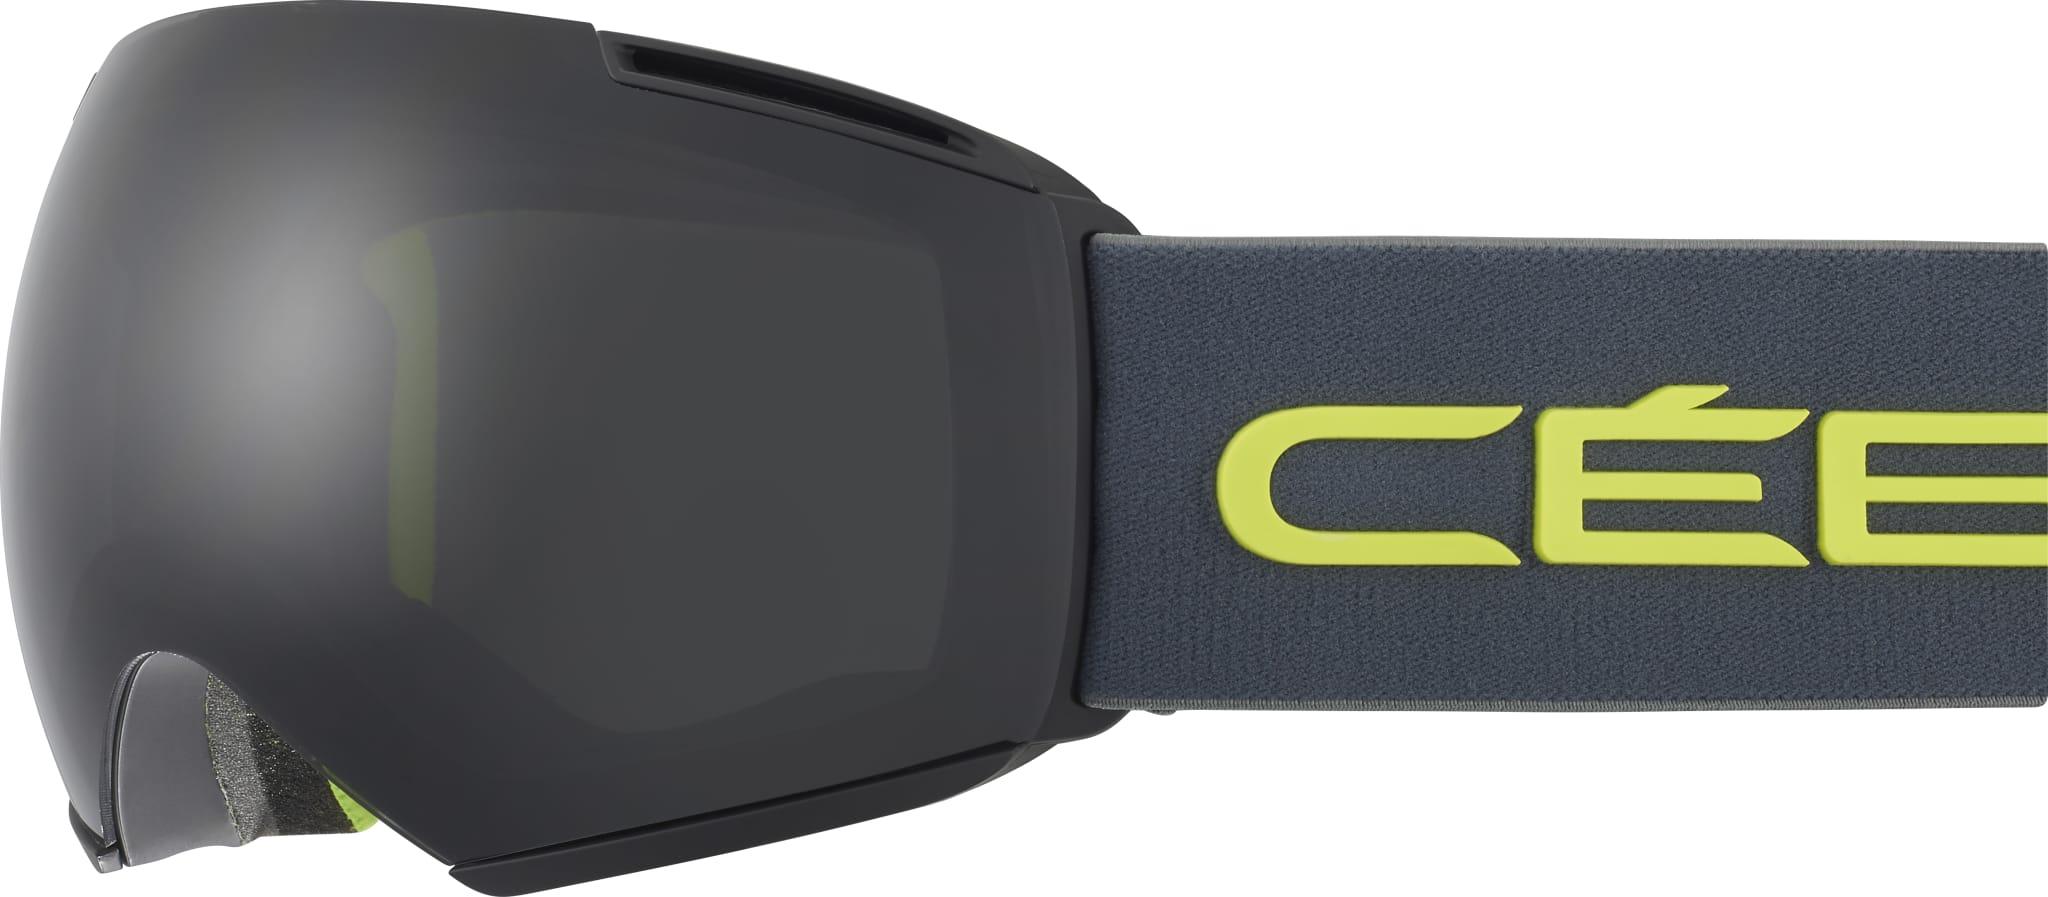 Svært bra synsfelt, god ventilering og ikke minst magnetiske linser, helt rått!